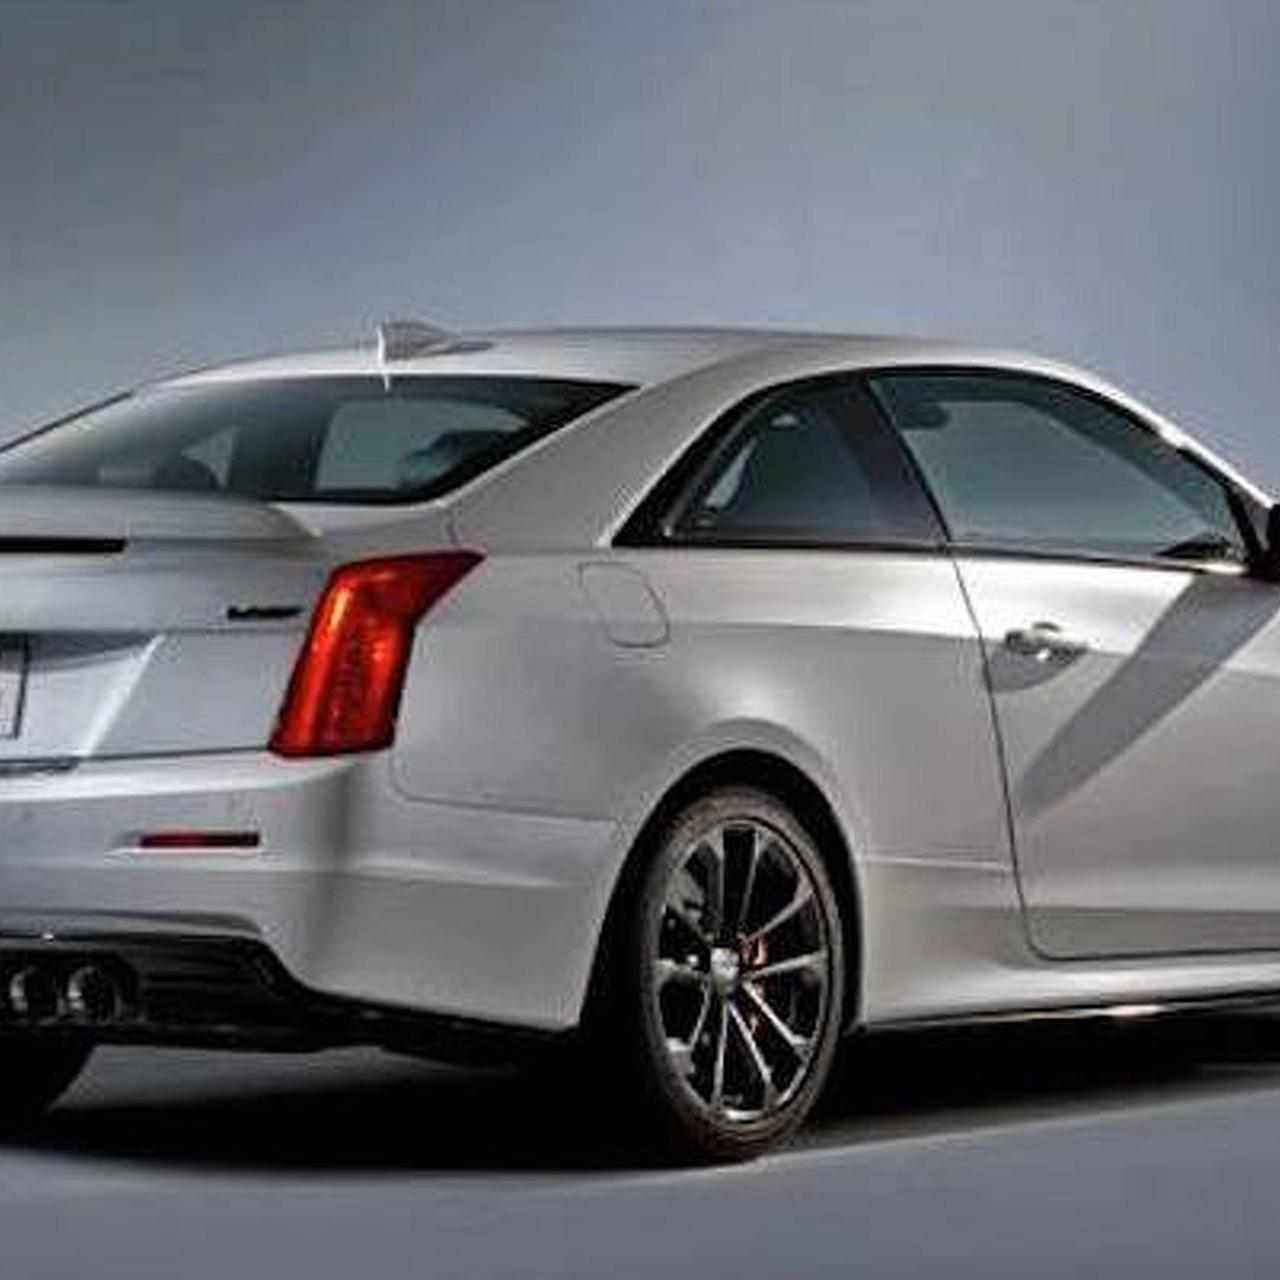 Cadillac ATS-V Coupe: America's M4 Killer